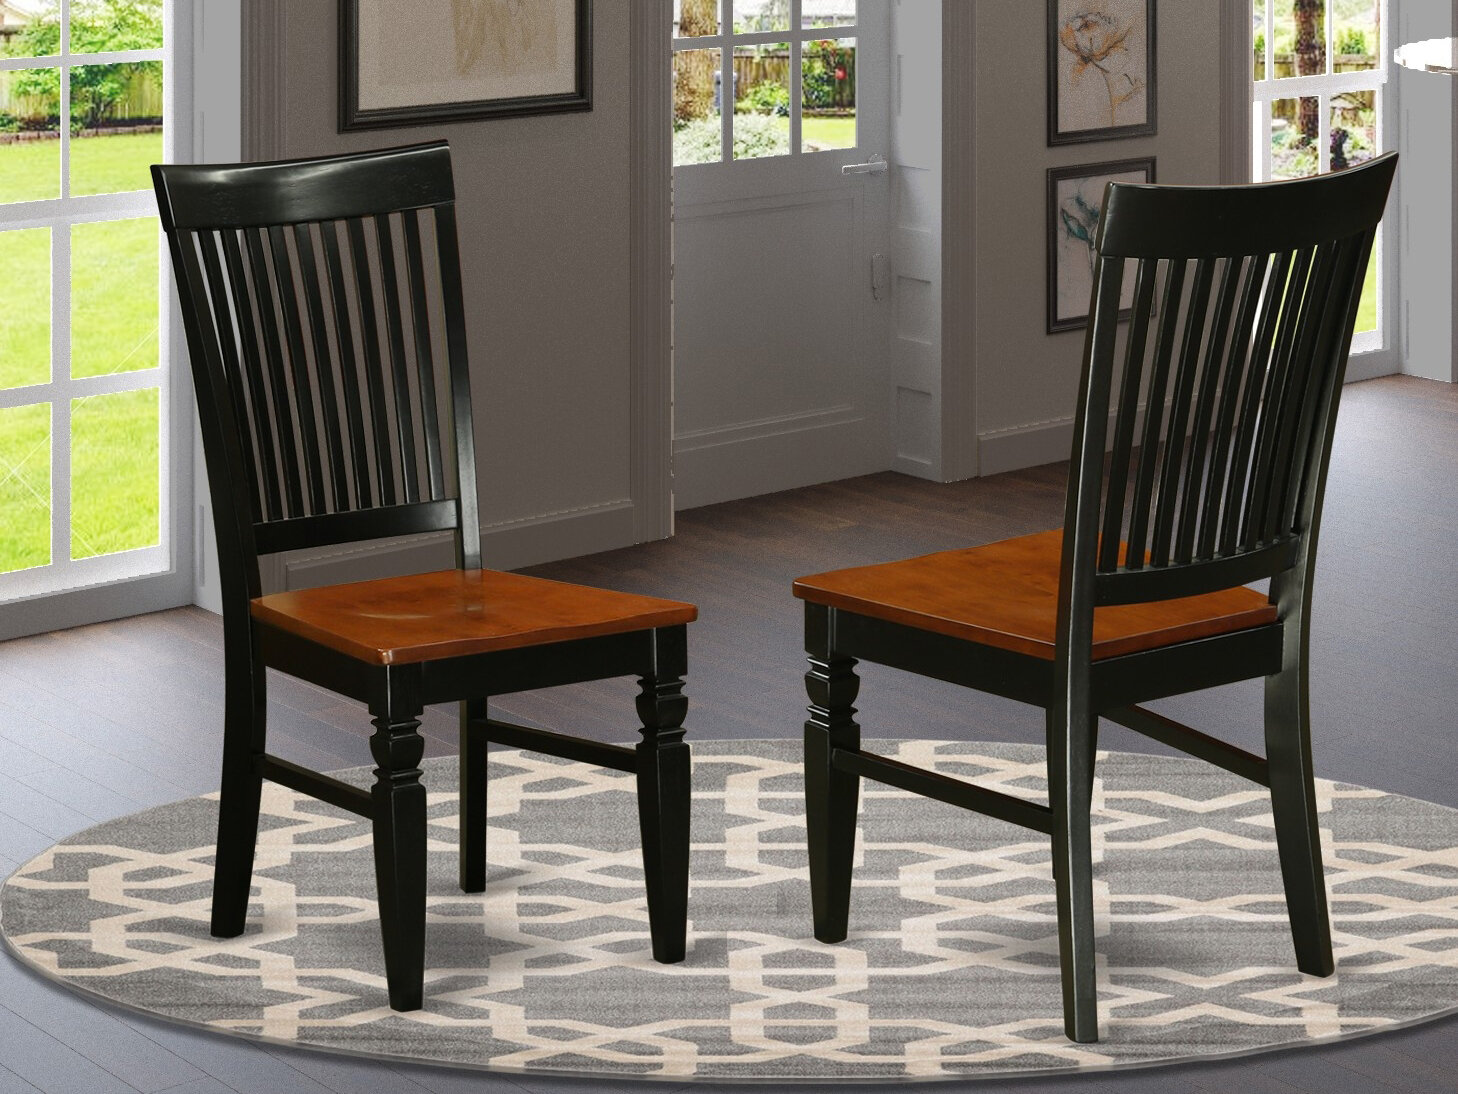 Darby Home Co Beesley Solid Wood Slat Back Side Chair Wayfair